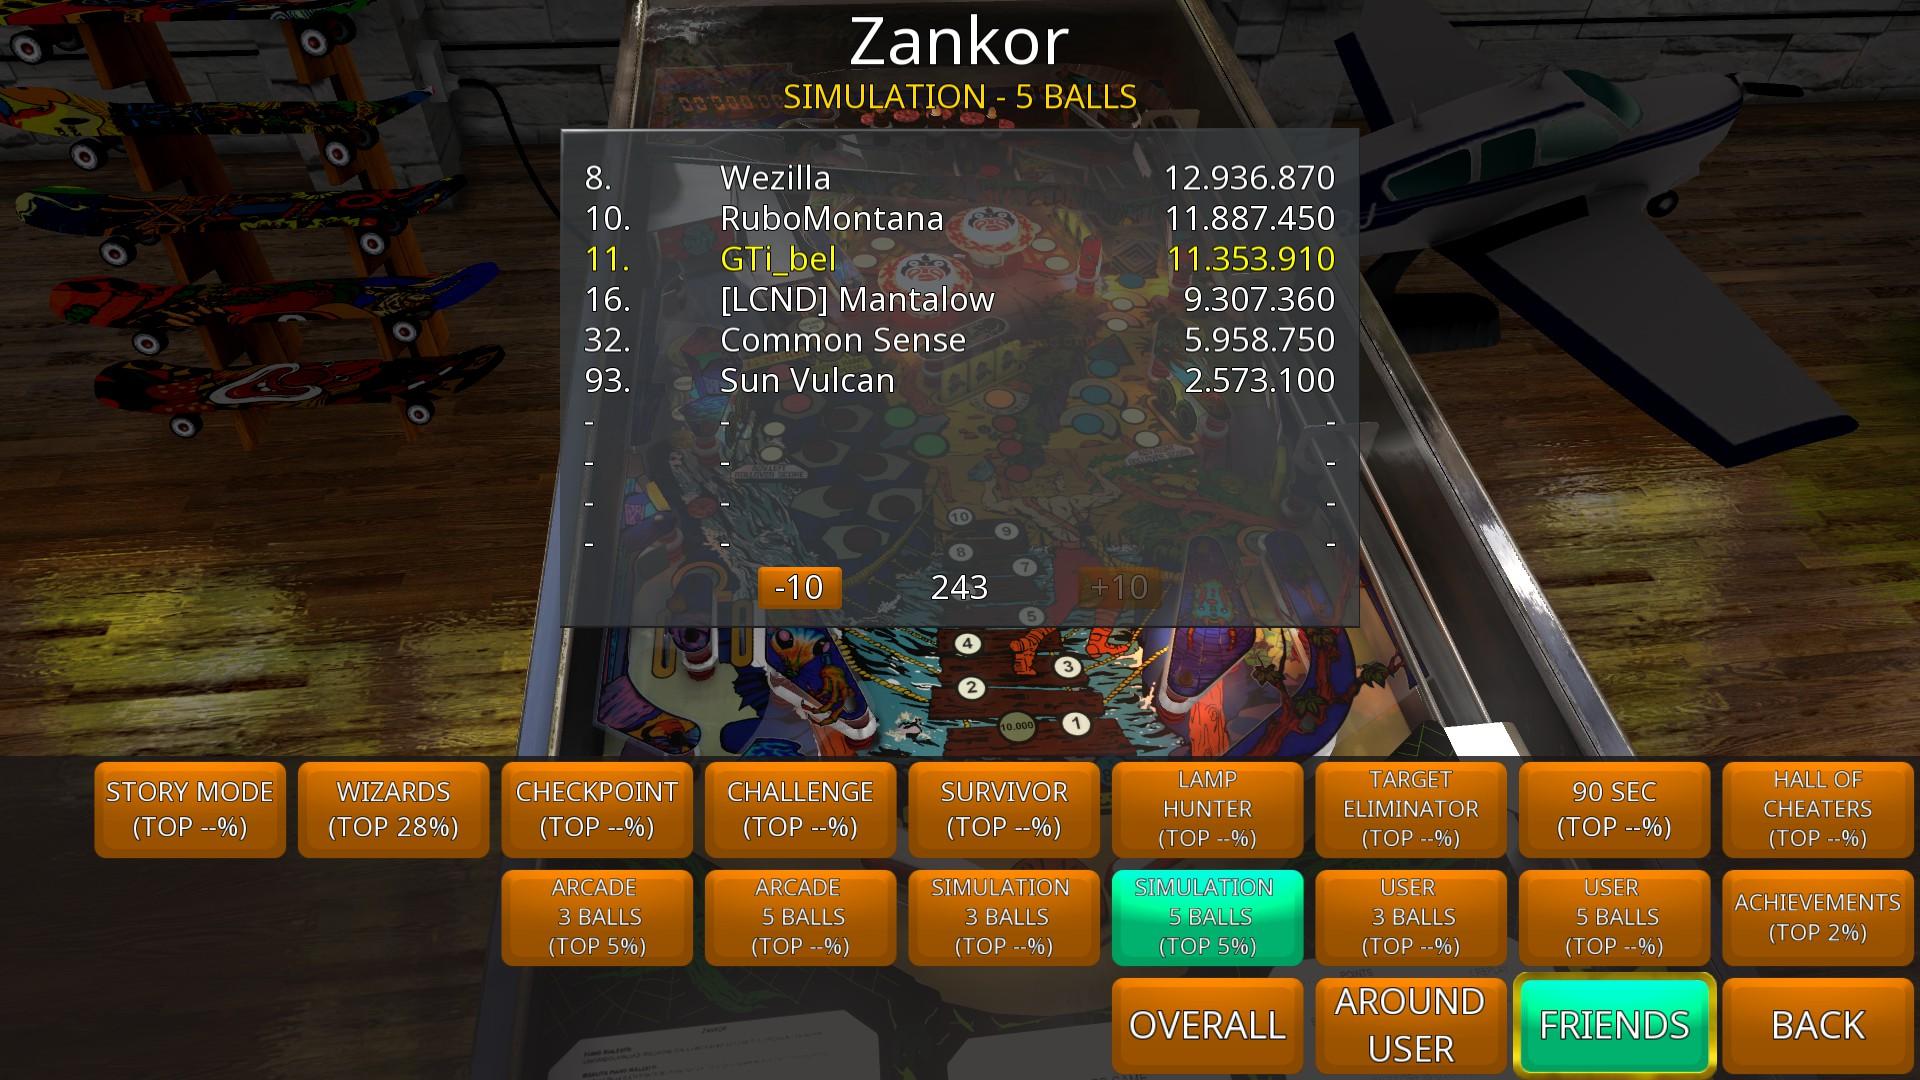 GTibel: Zaccaria Pinball: Zankor [5 balls] (PC) 11,353,910 points on 2018-08-13 12:08:20